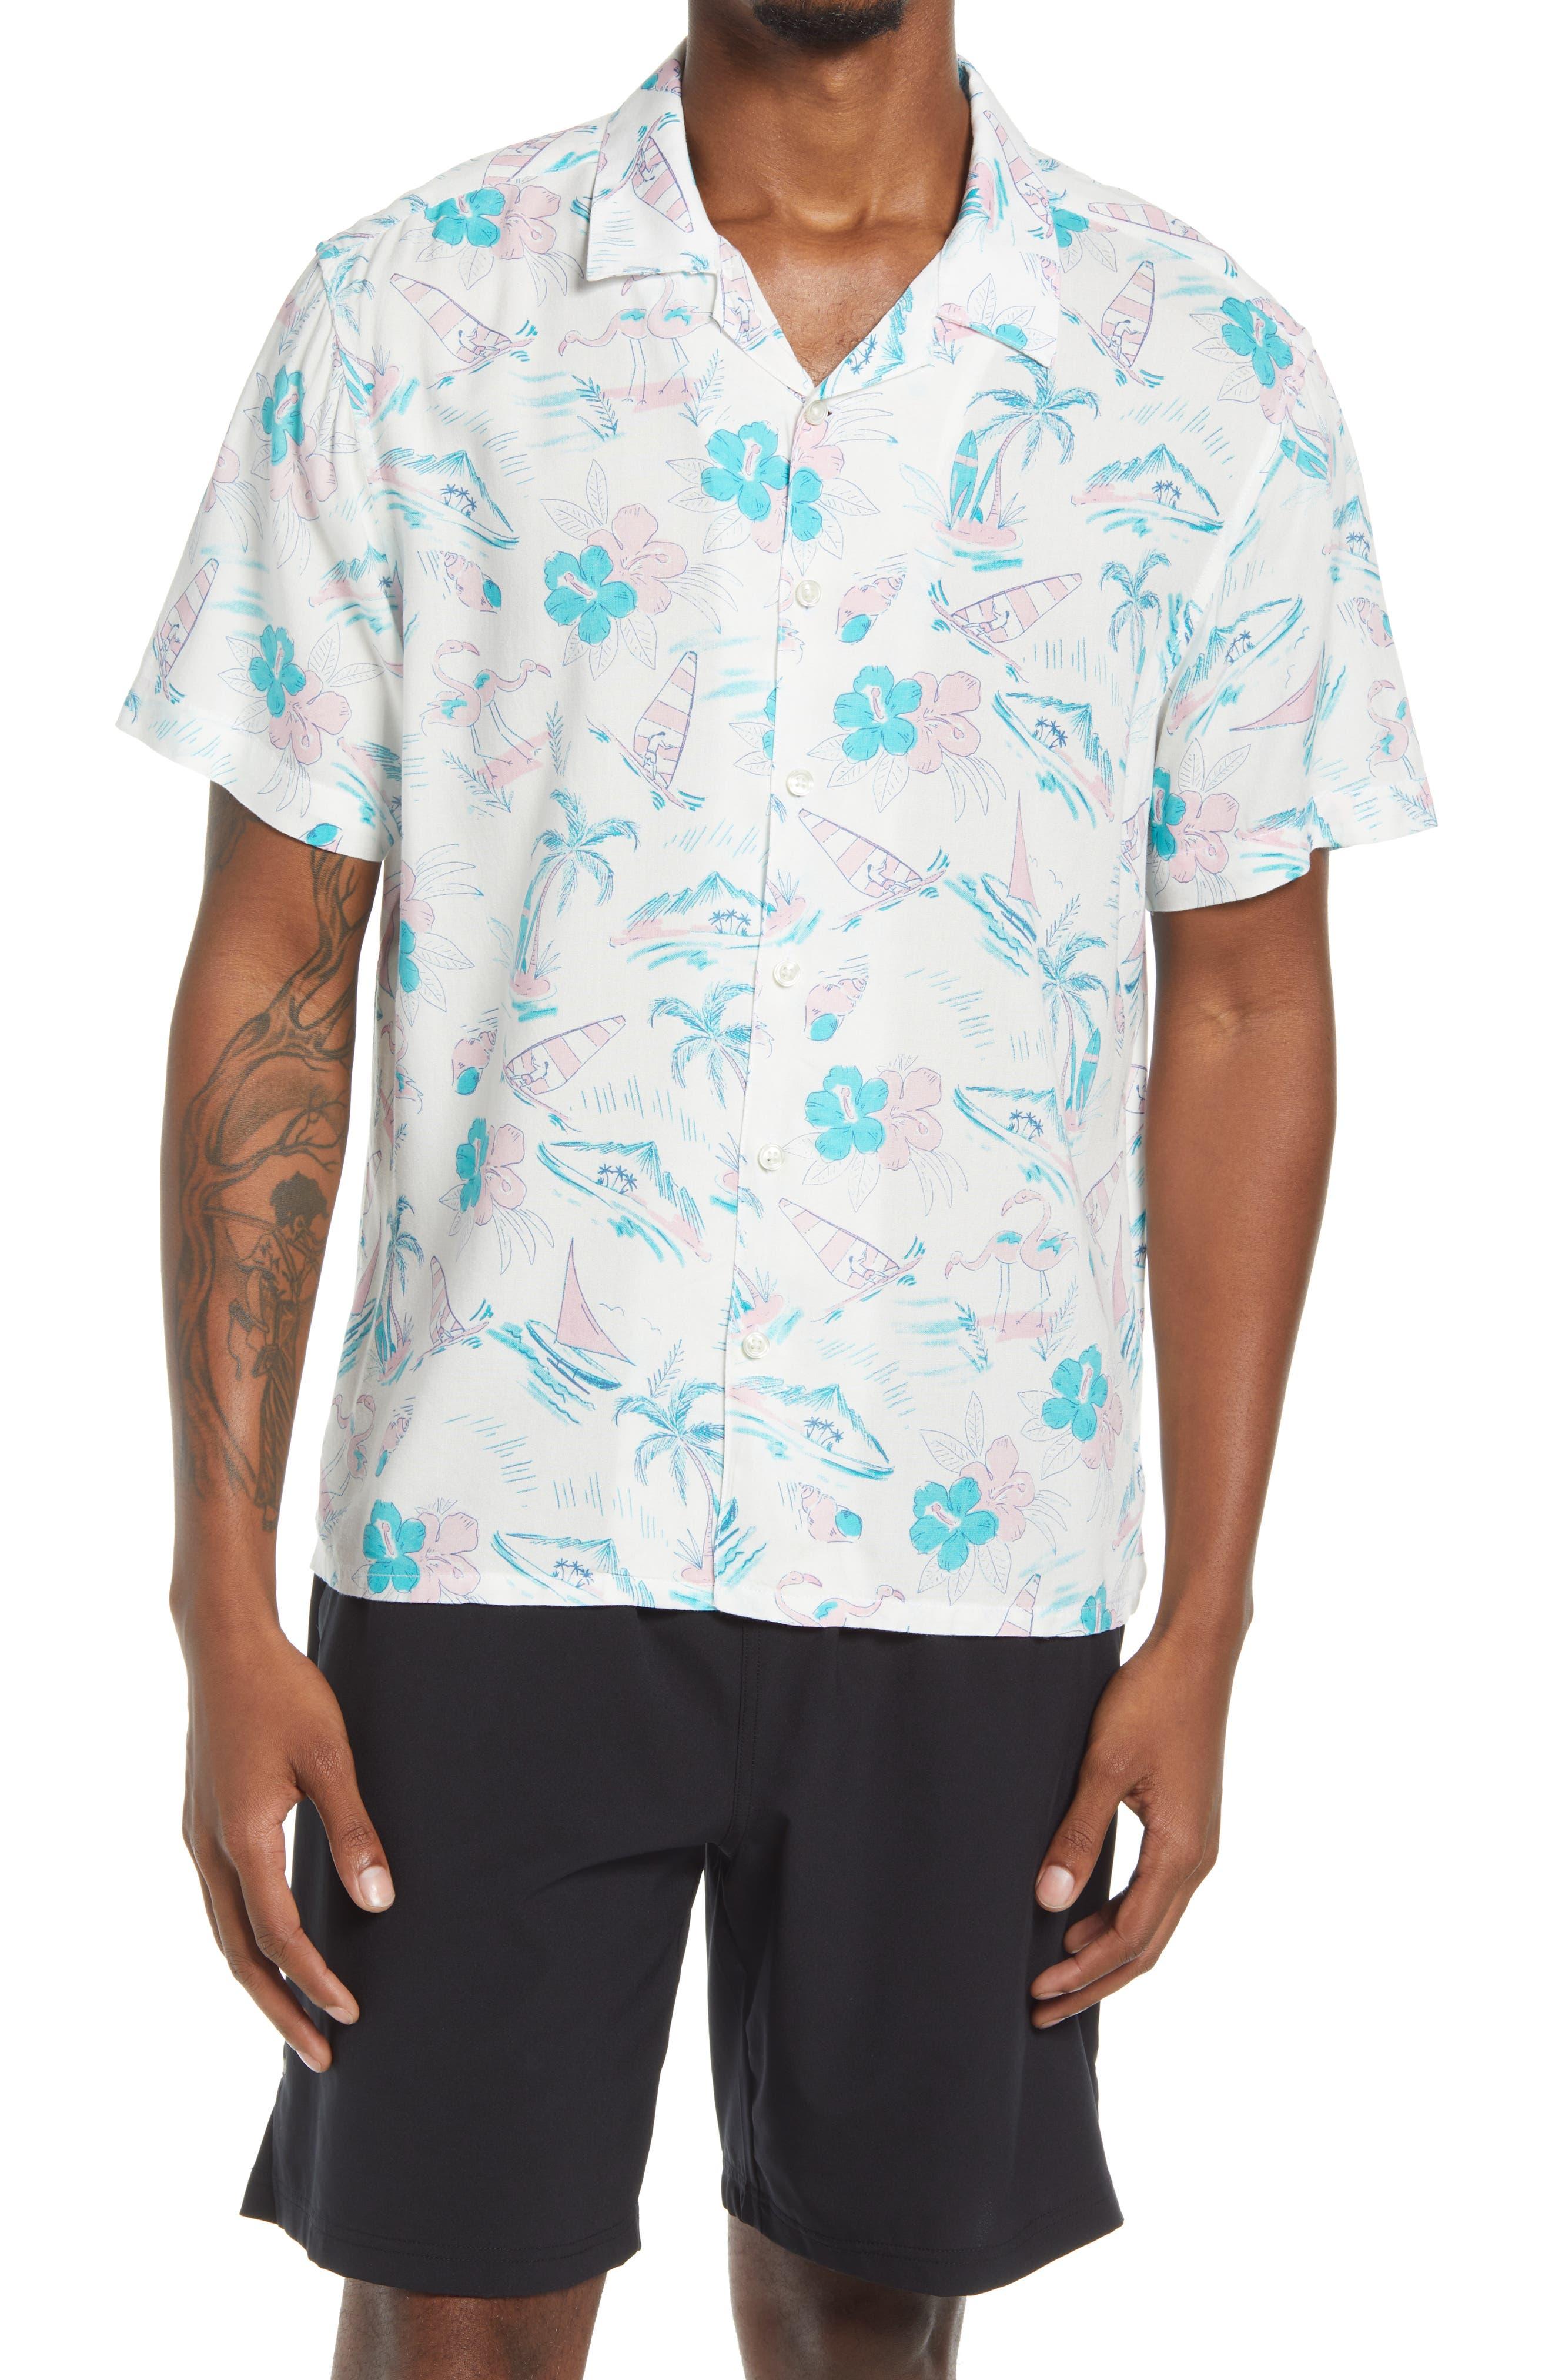 Year Round Summer Short Sleeve Button-Up Camp Shirt